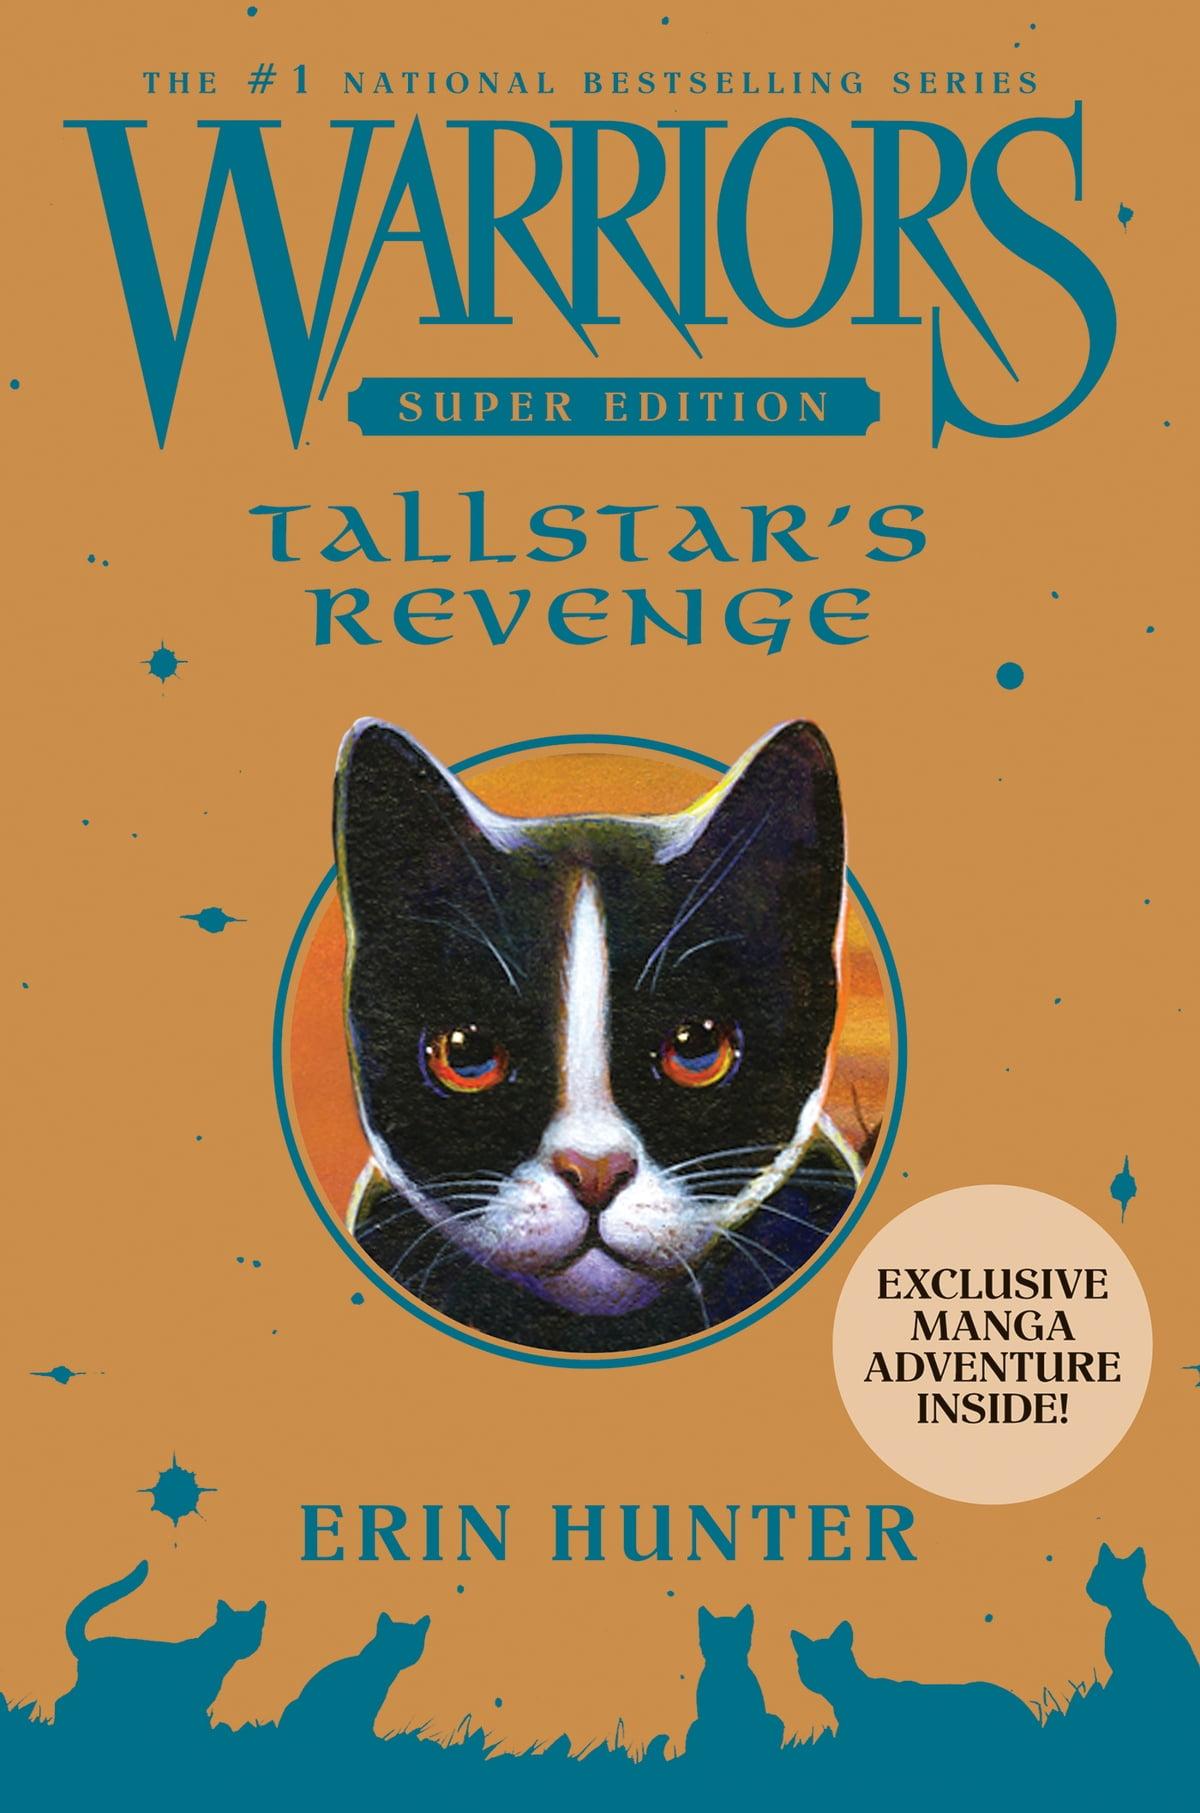 Cat Warrior Games By Erin Hunter